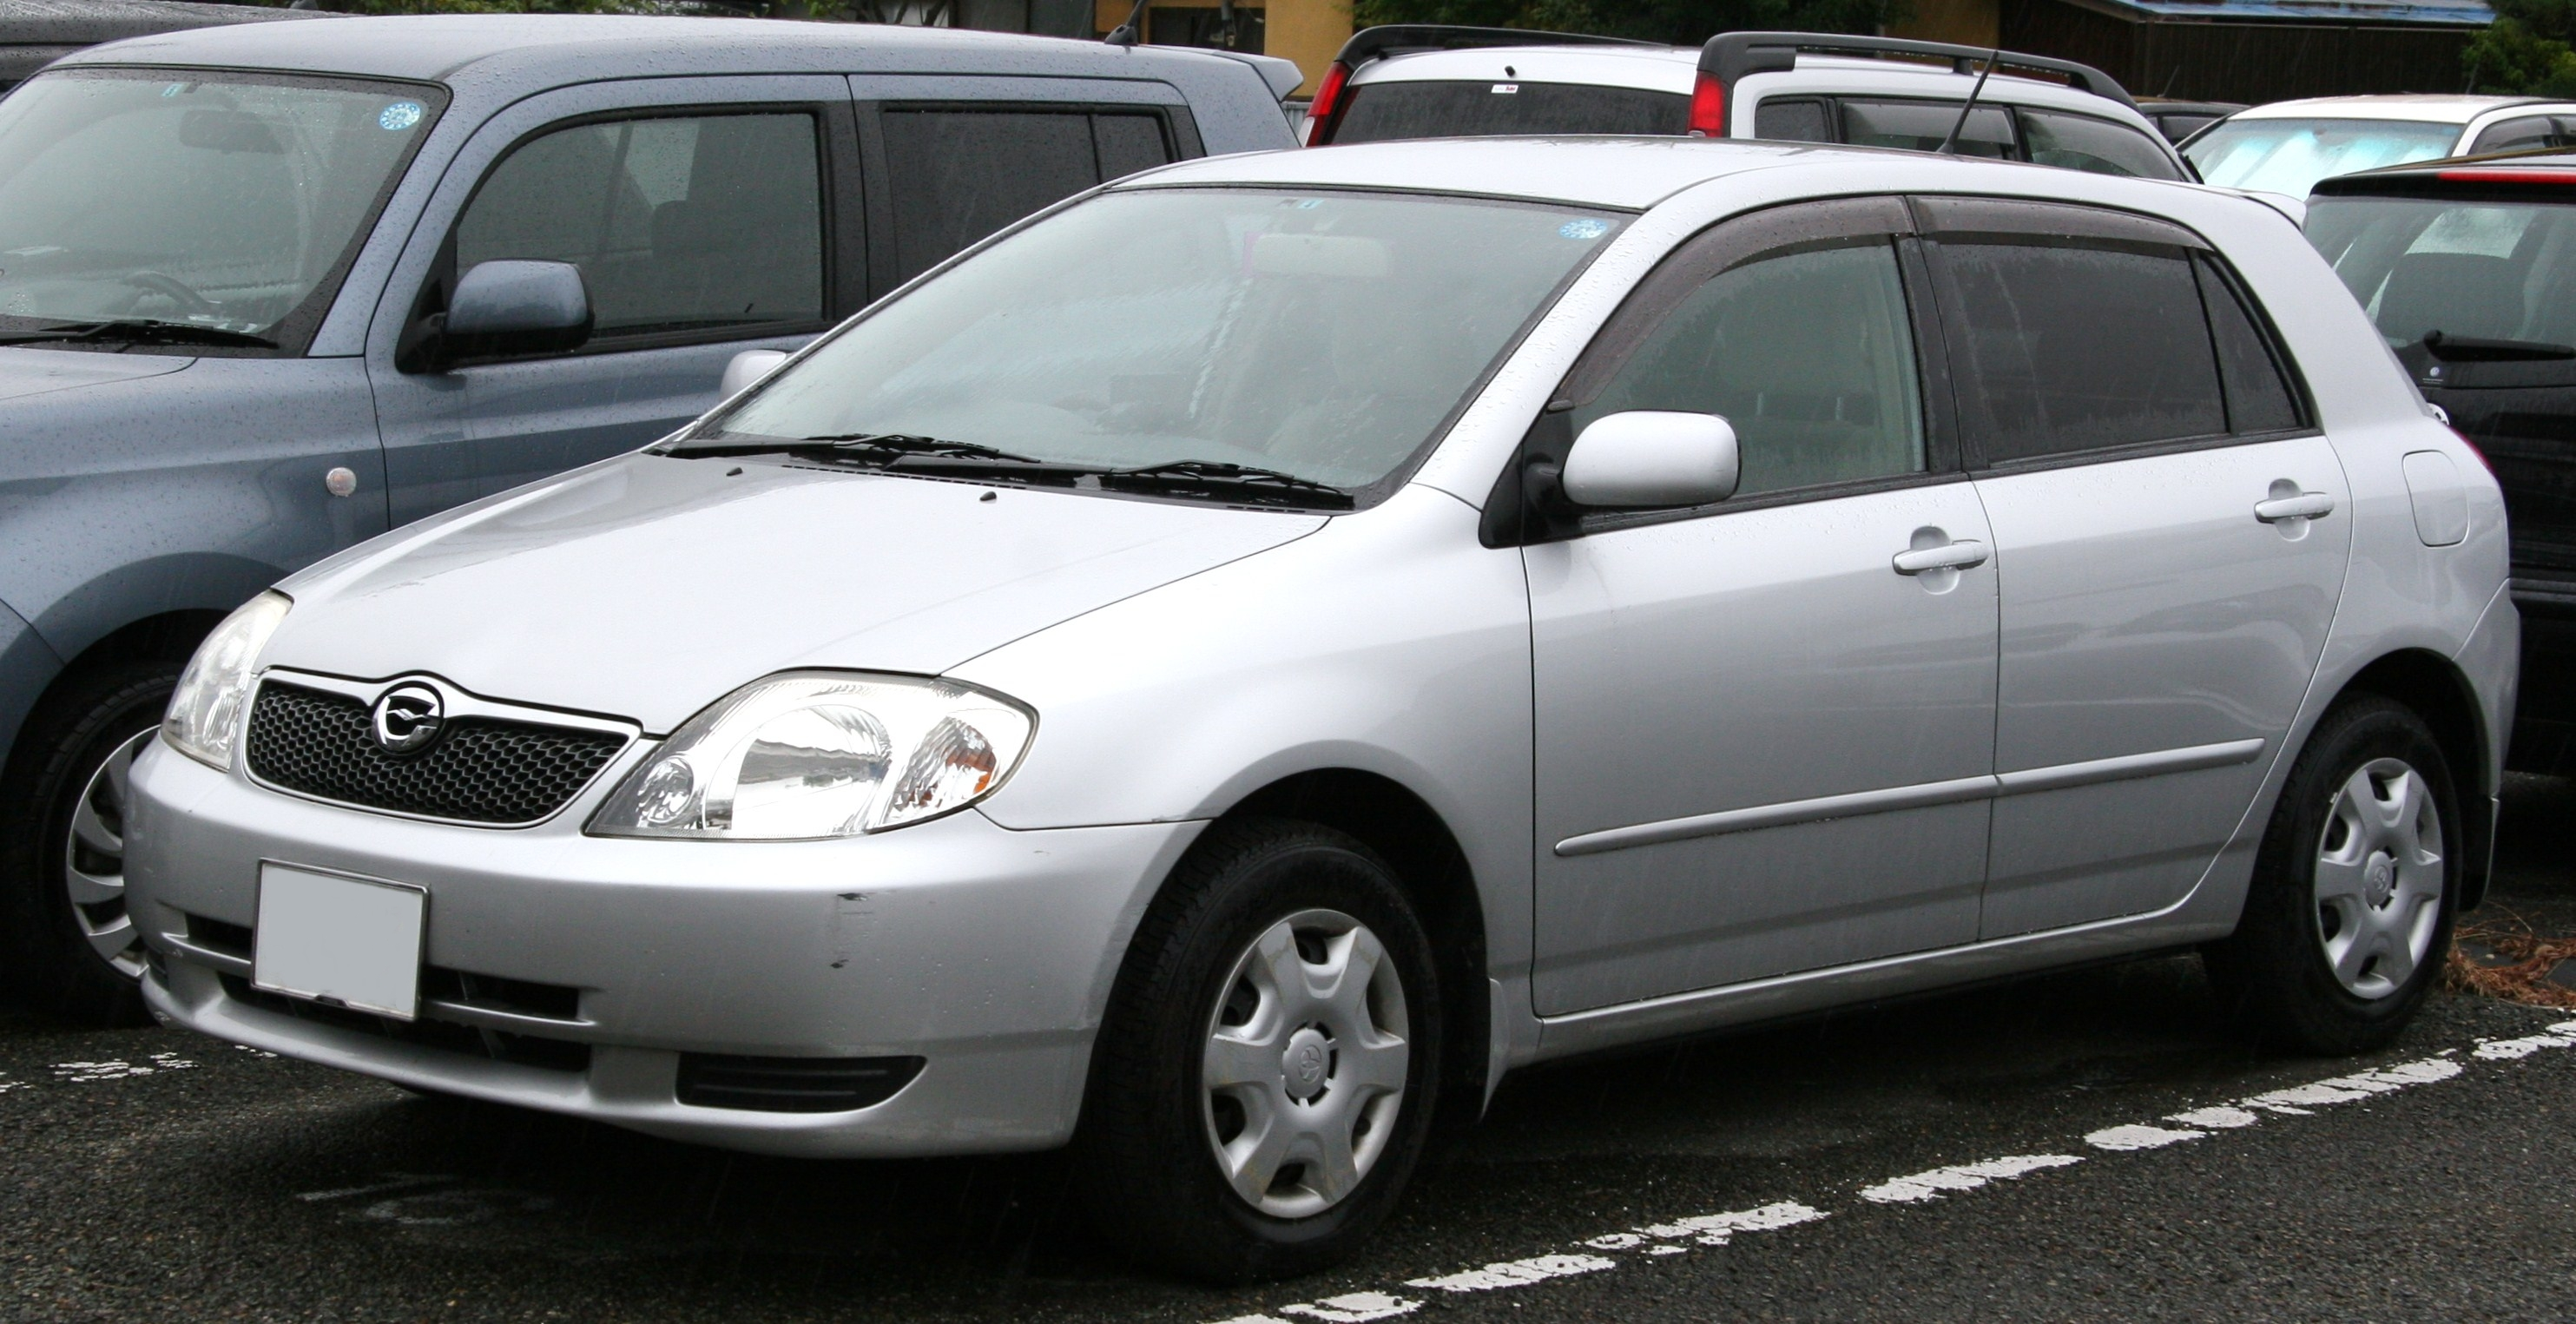 File:2001-2002 Toyota Corolla Runx.jpg